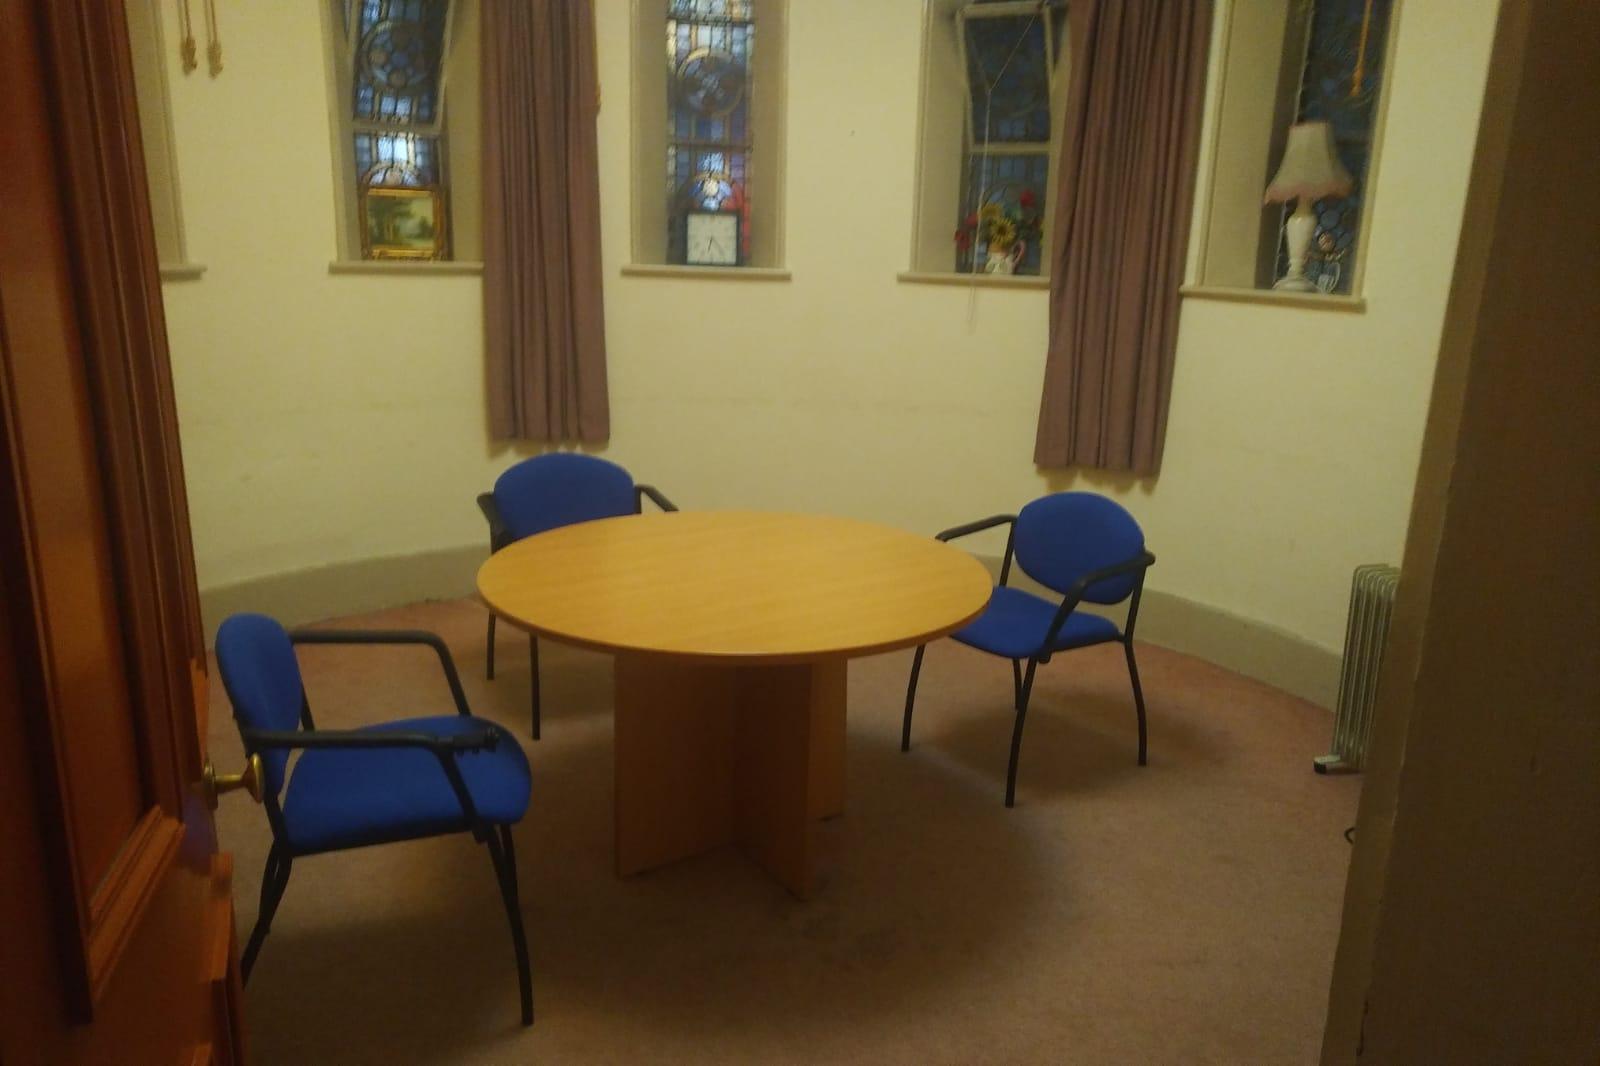 Lower Round Room 2